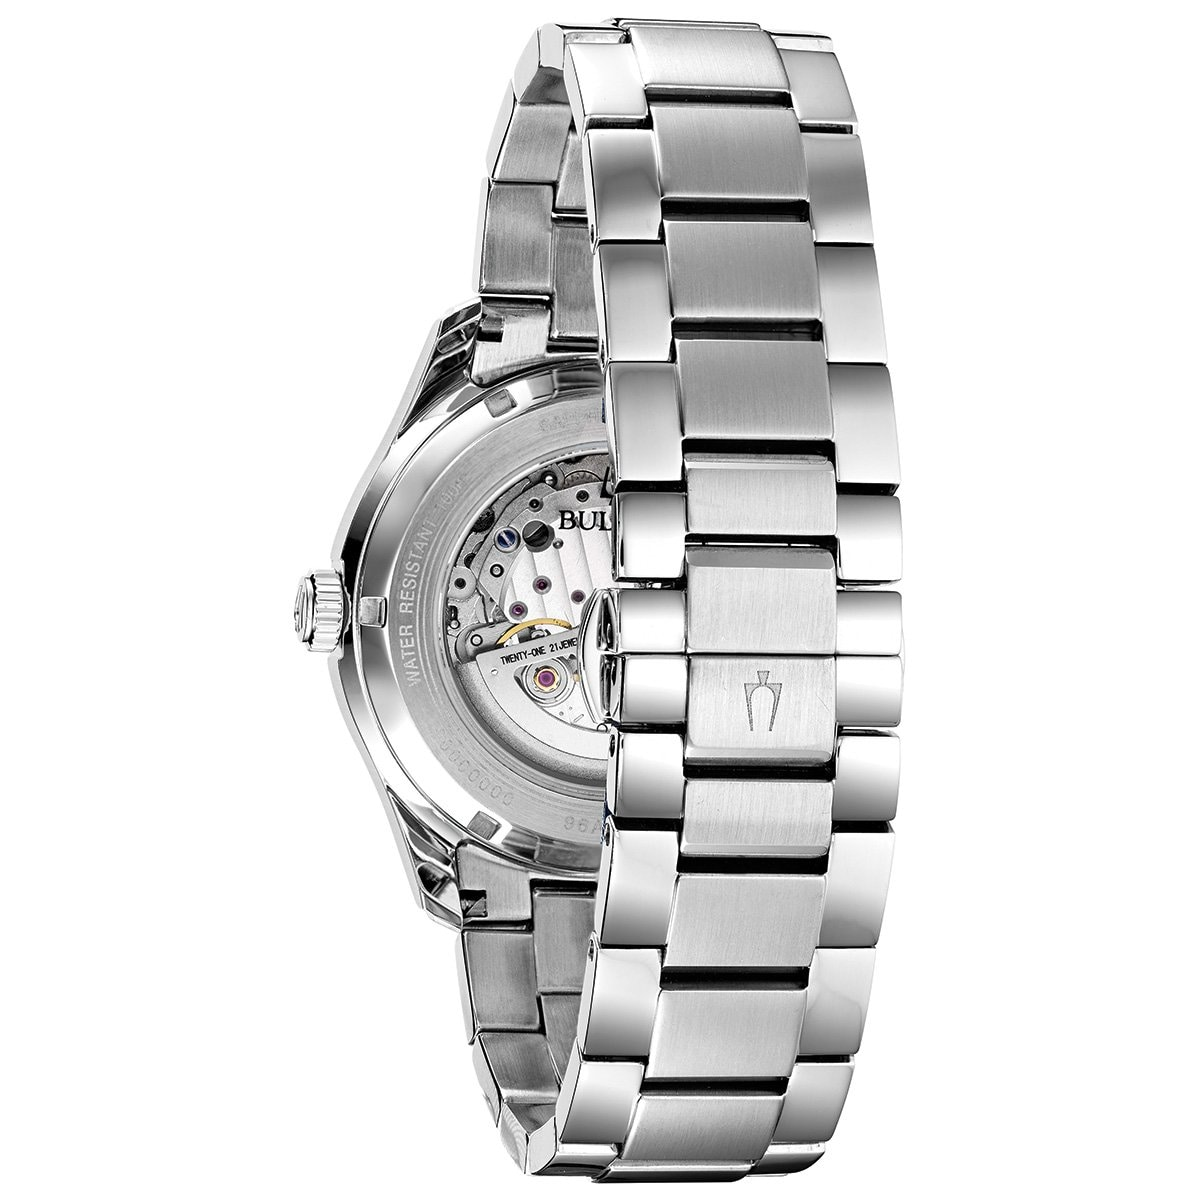 Reloj para Caballero Bulova Color Plata